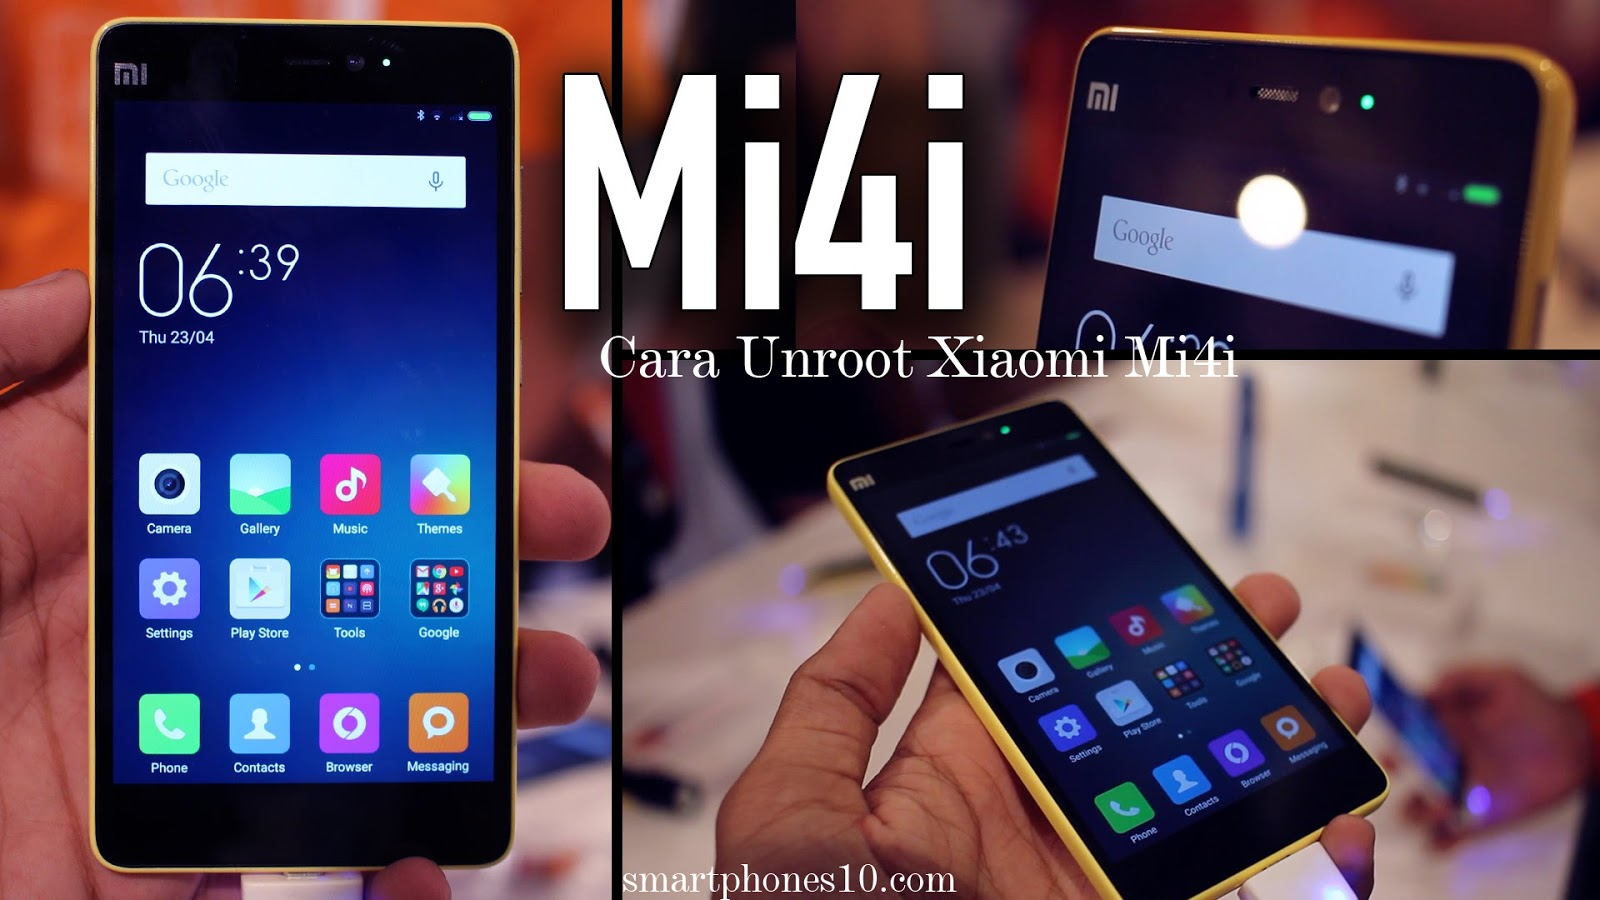 Cara Unroot Pada Smartphone Android Xiaomi Mi4i